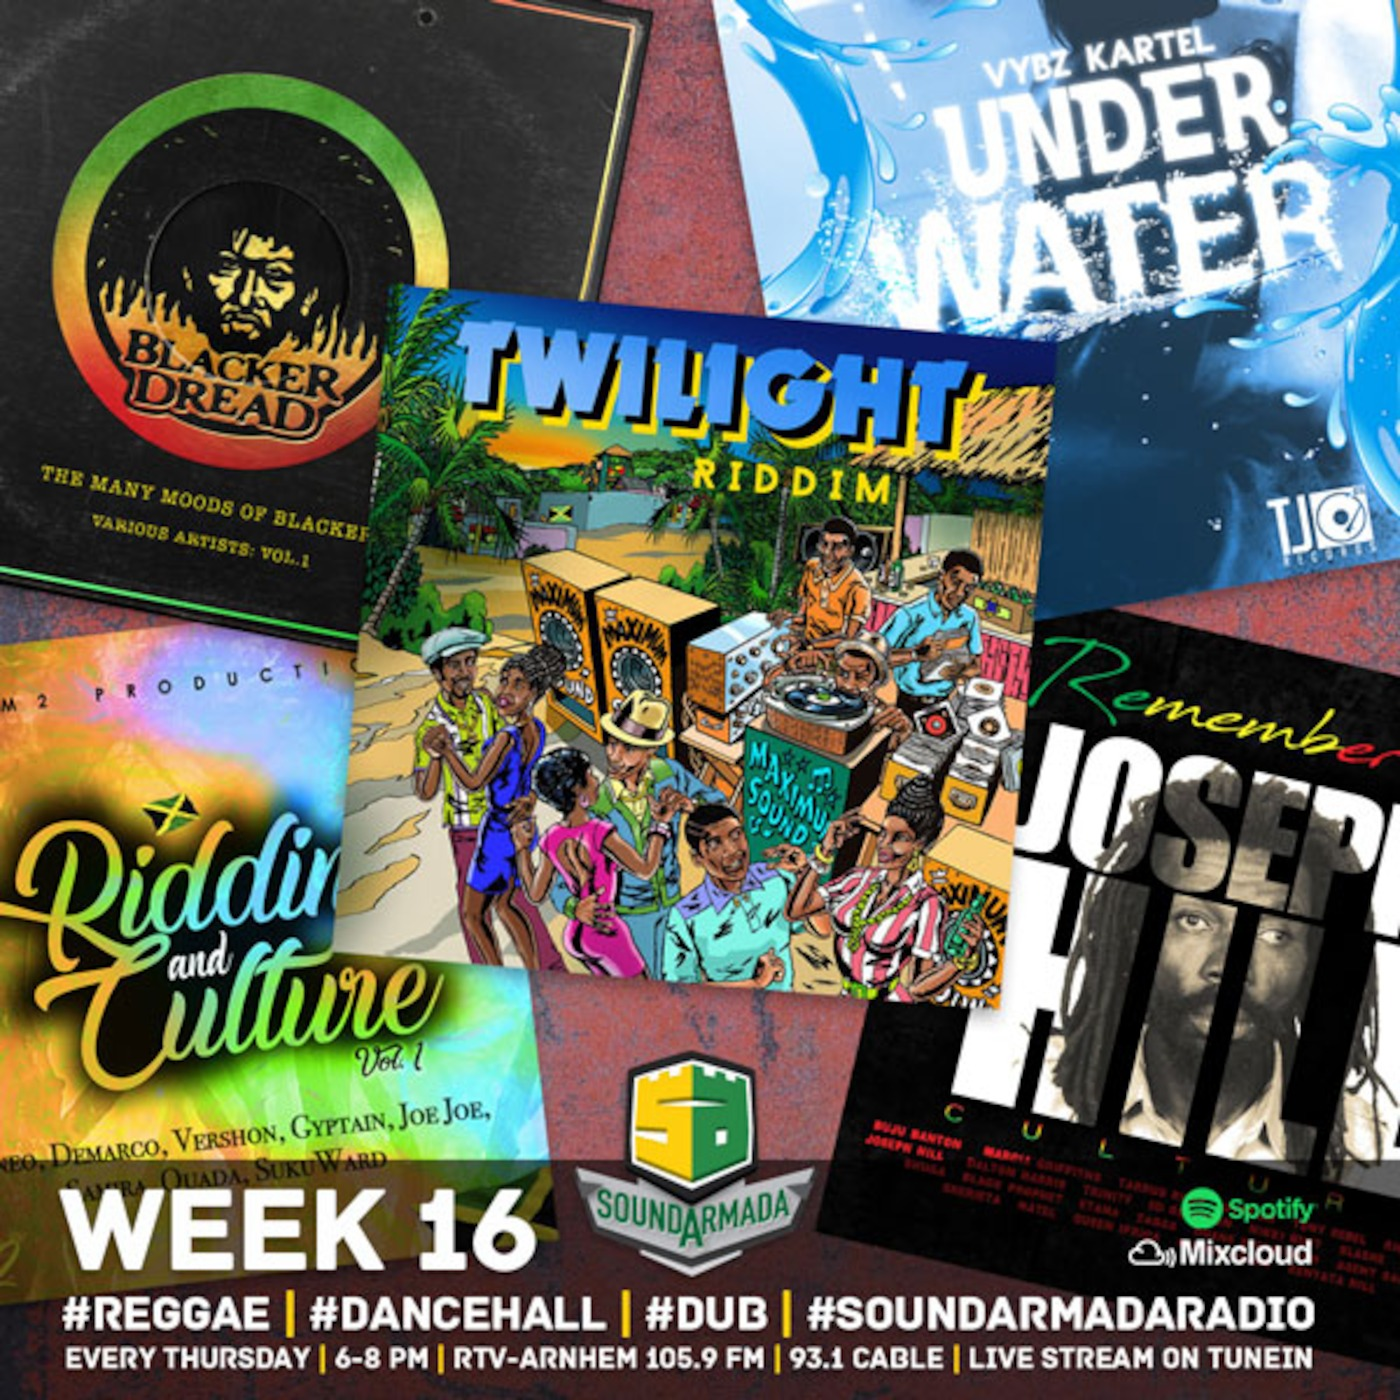 Sound Armada Reggae Dancehall Radio Week 16 2018 SOUND